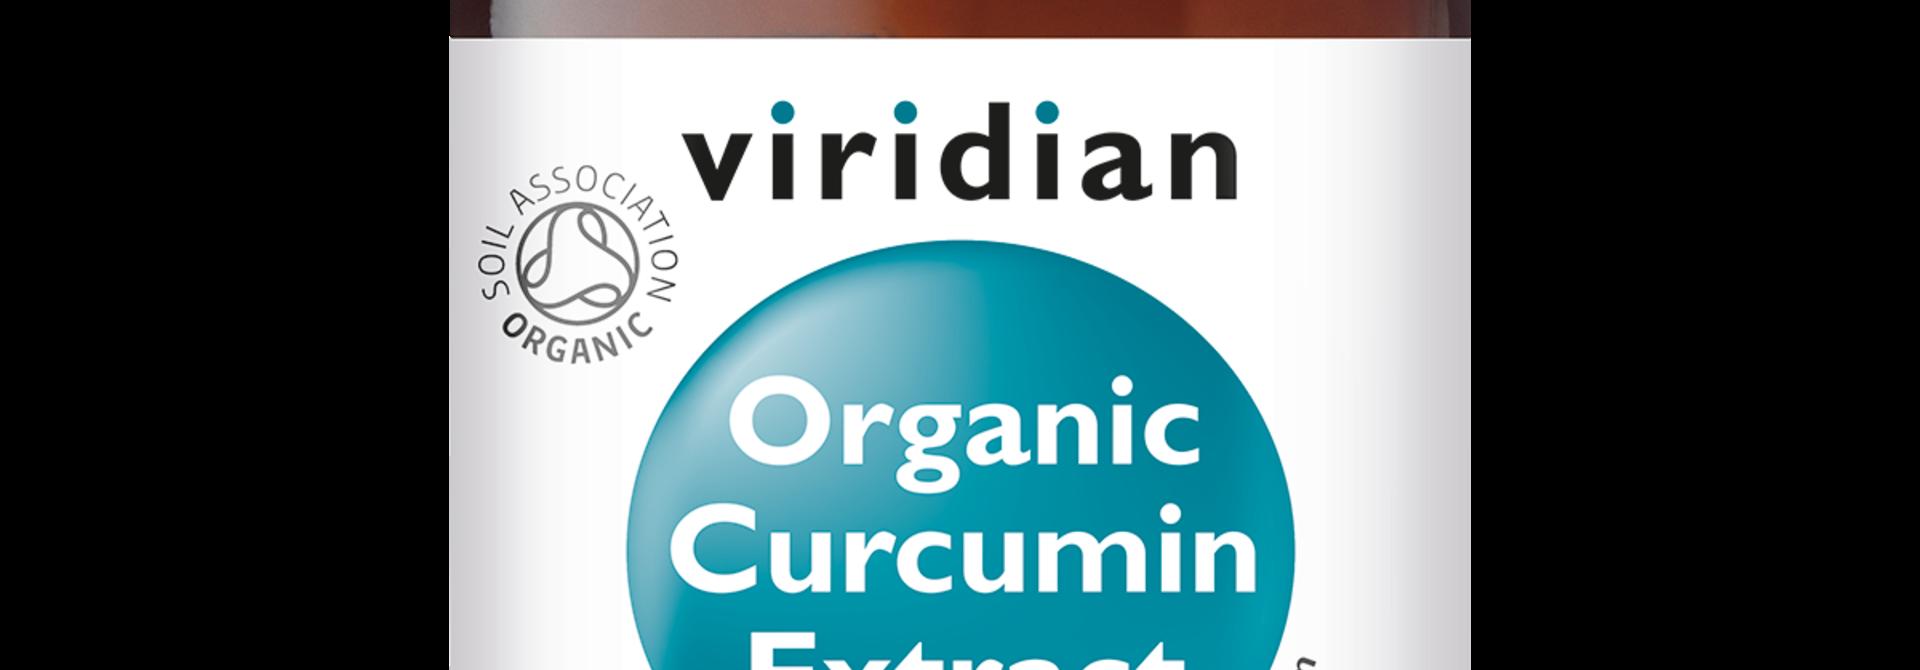 Organic Curcumin Extract 60 plantaardige capsules